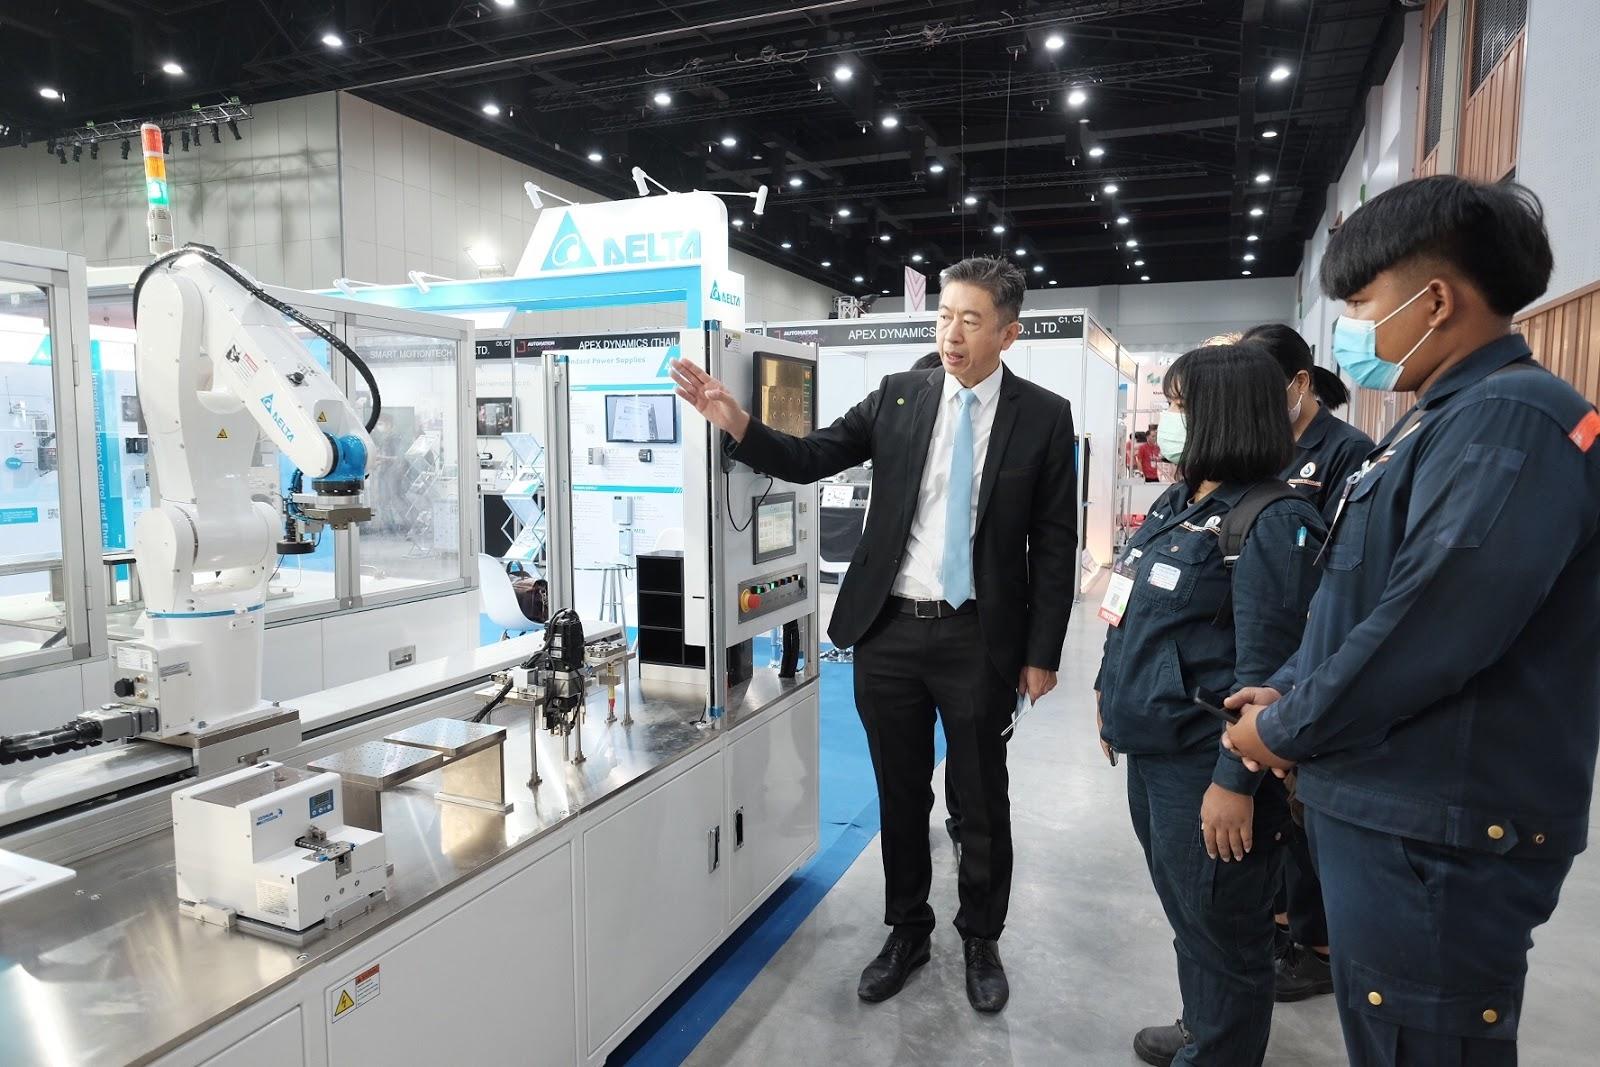 Delta จัดแสดงโซลูชันระบบอุตสาหกรรมอัตโนมัติเพื่อกระตุ้นการฟื้นตัวภาคการผลิตในยุค New Normal ณ งาน Automation Expo 2020